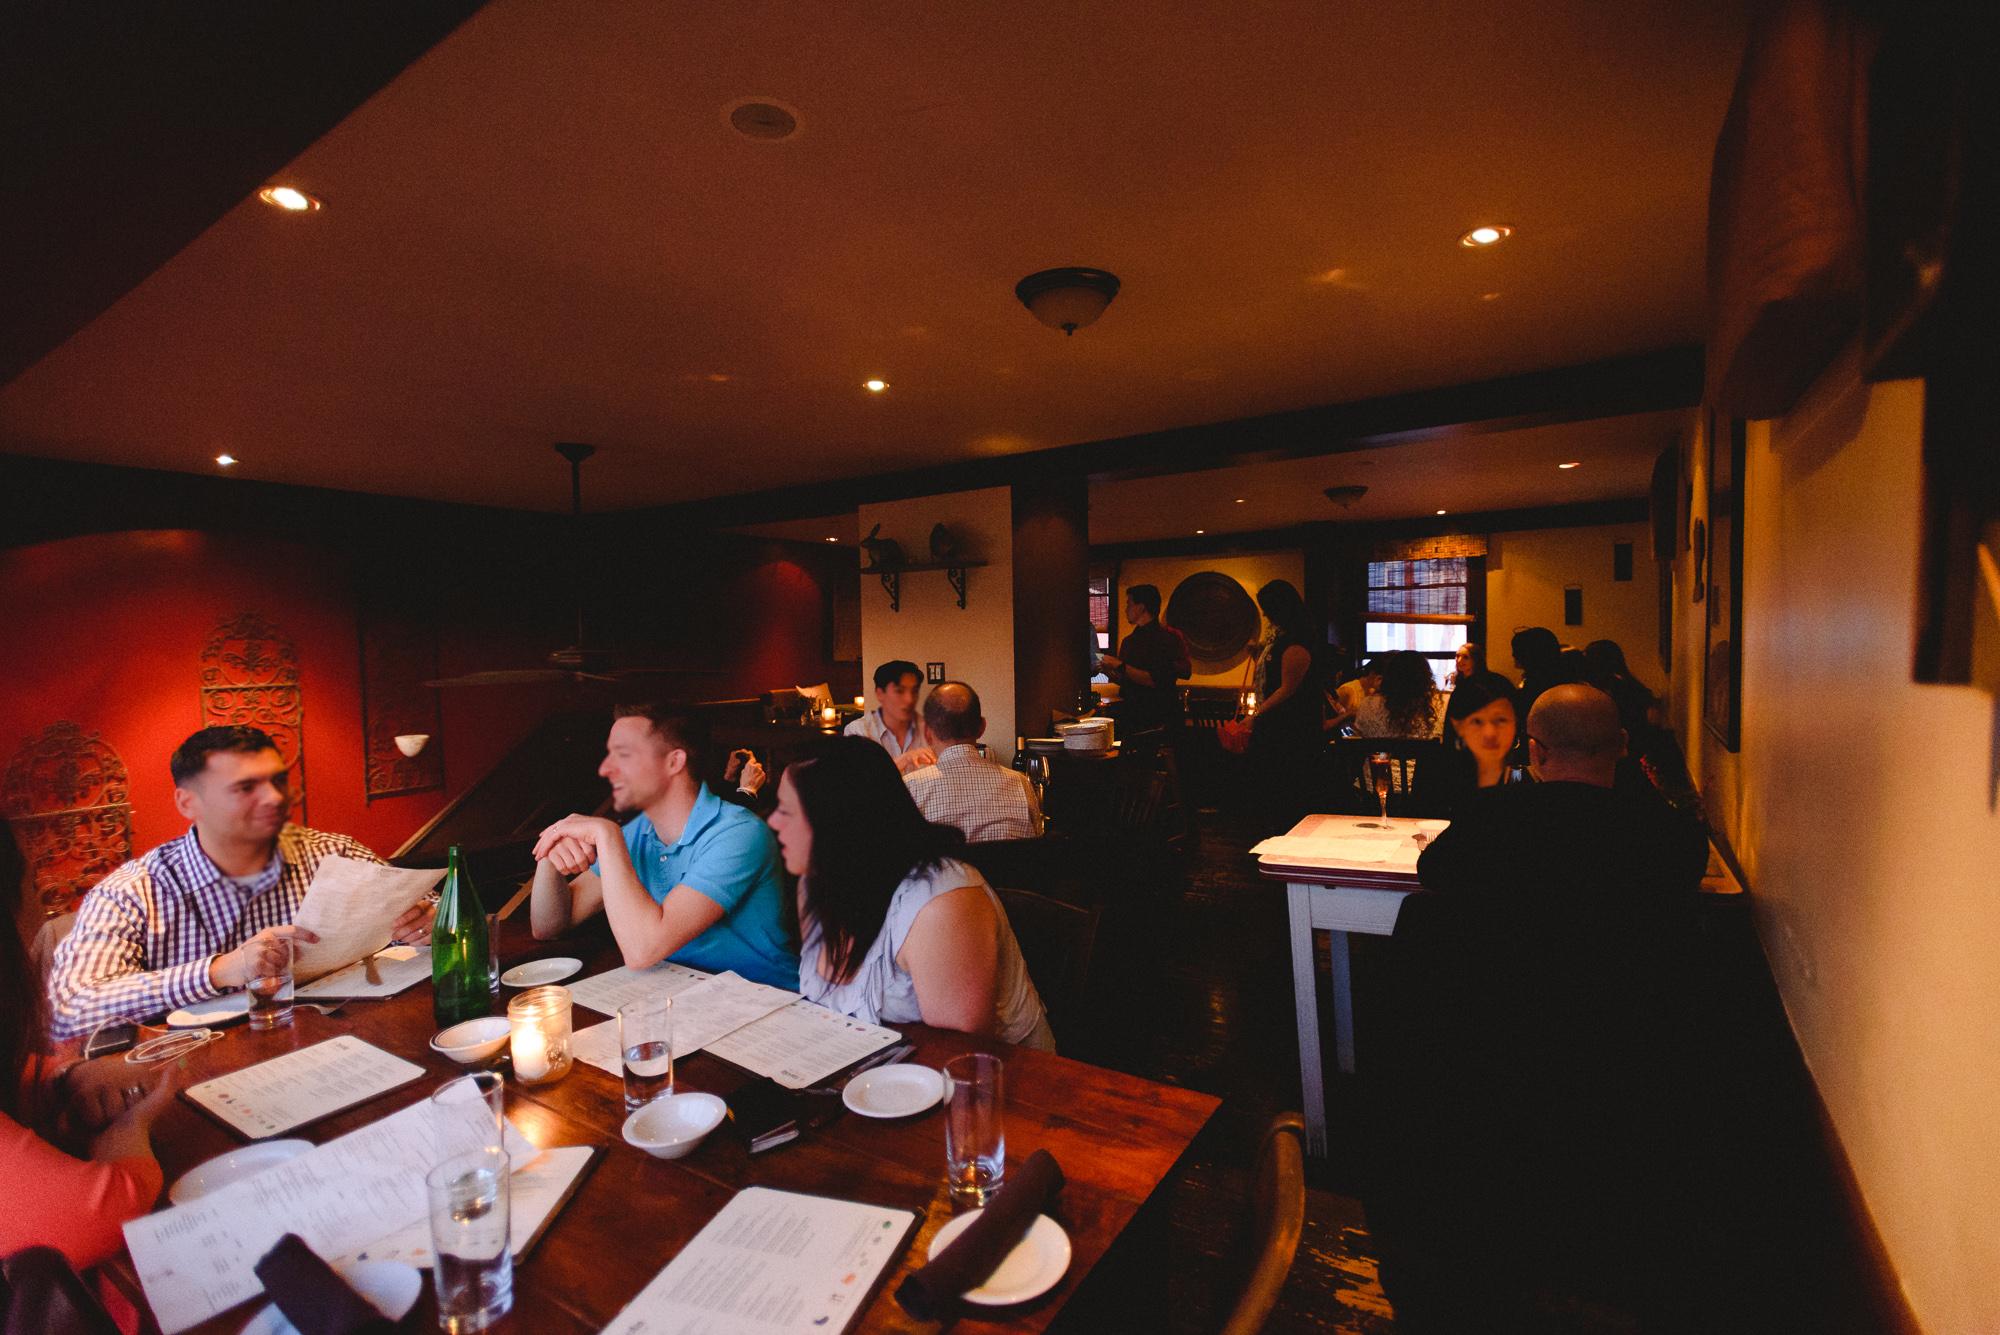 A-Tavola-Trattoria-New-Paltz-Hudson-Valley-NY-Best-Italian-Restaurant-234.jpg